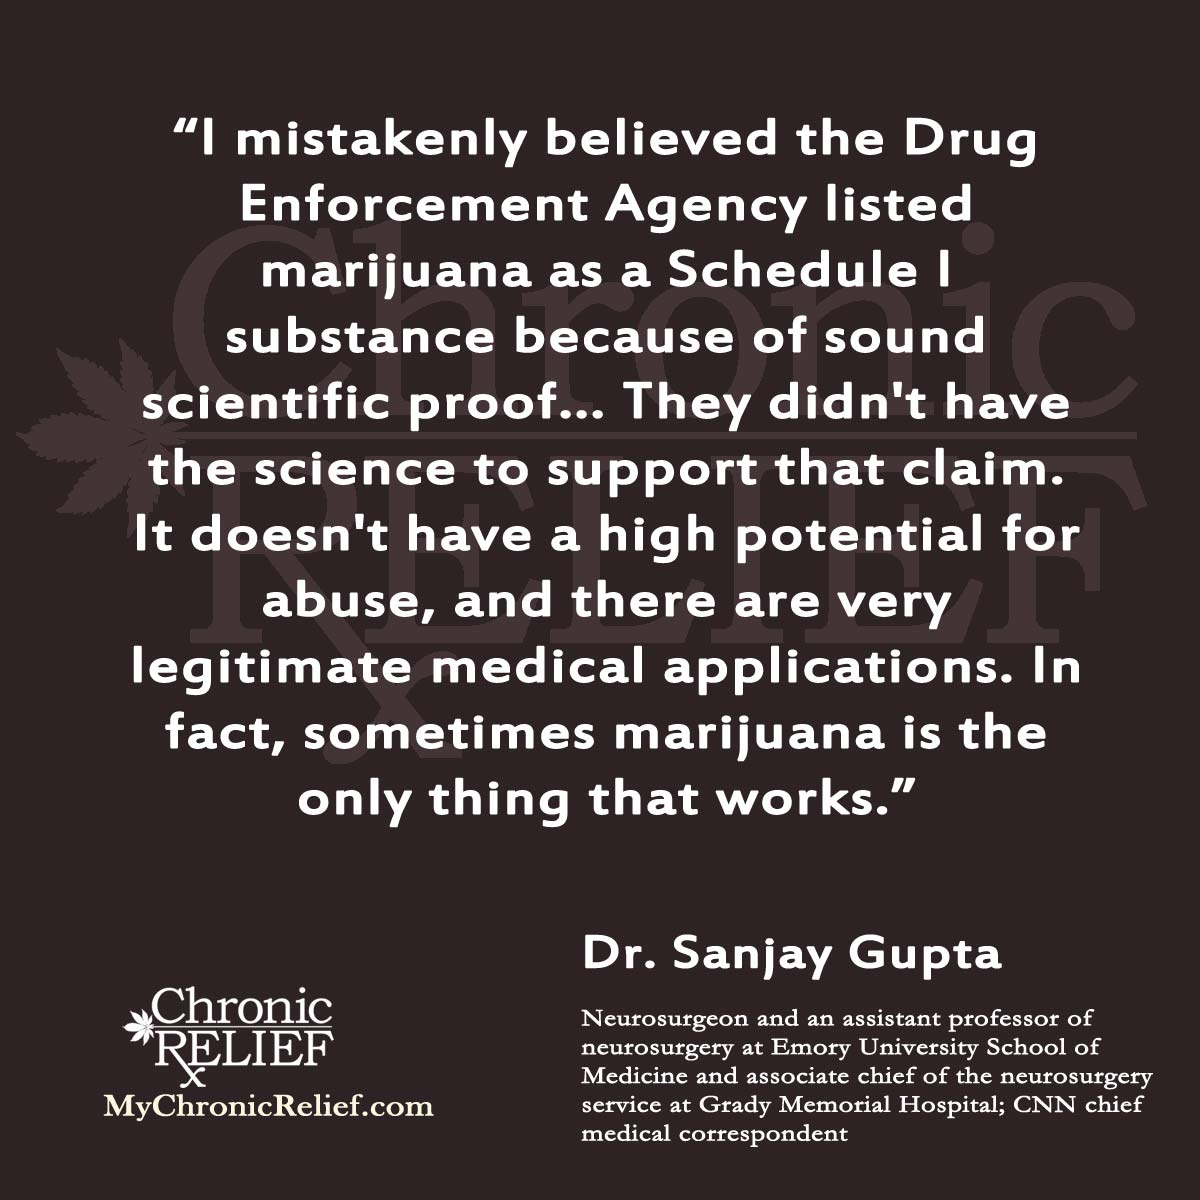 Sanjay-Gupta-quote-B.jpg